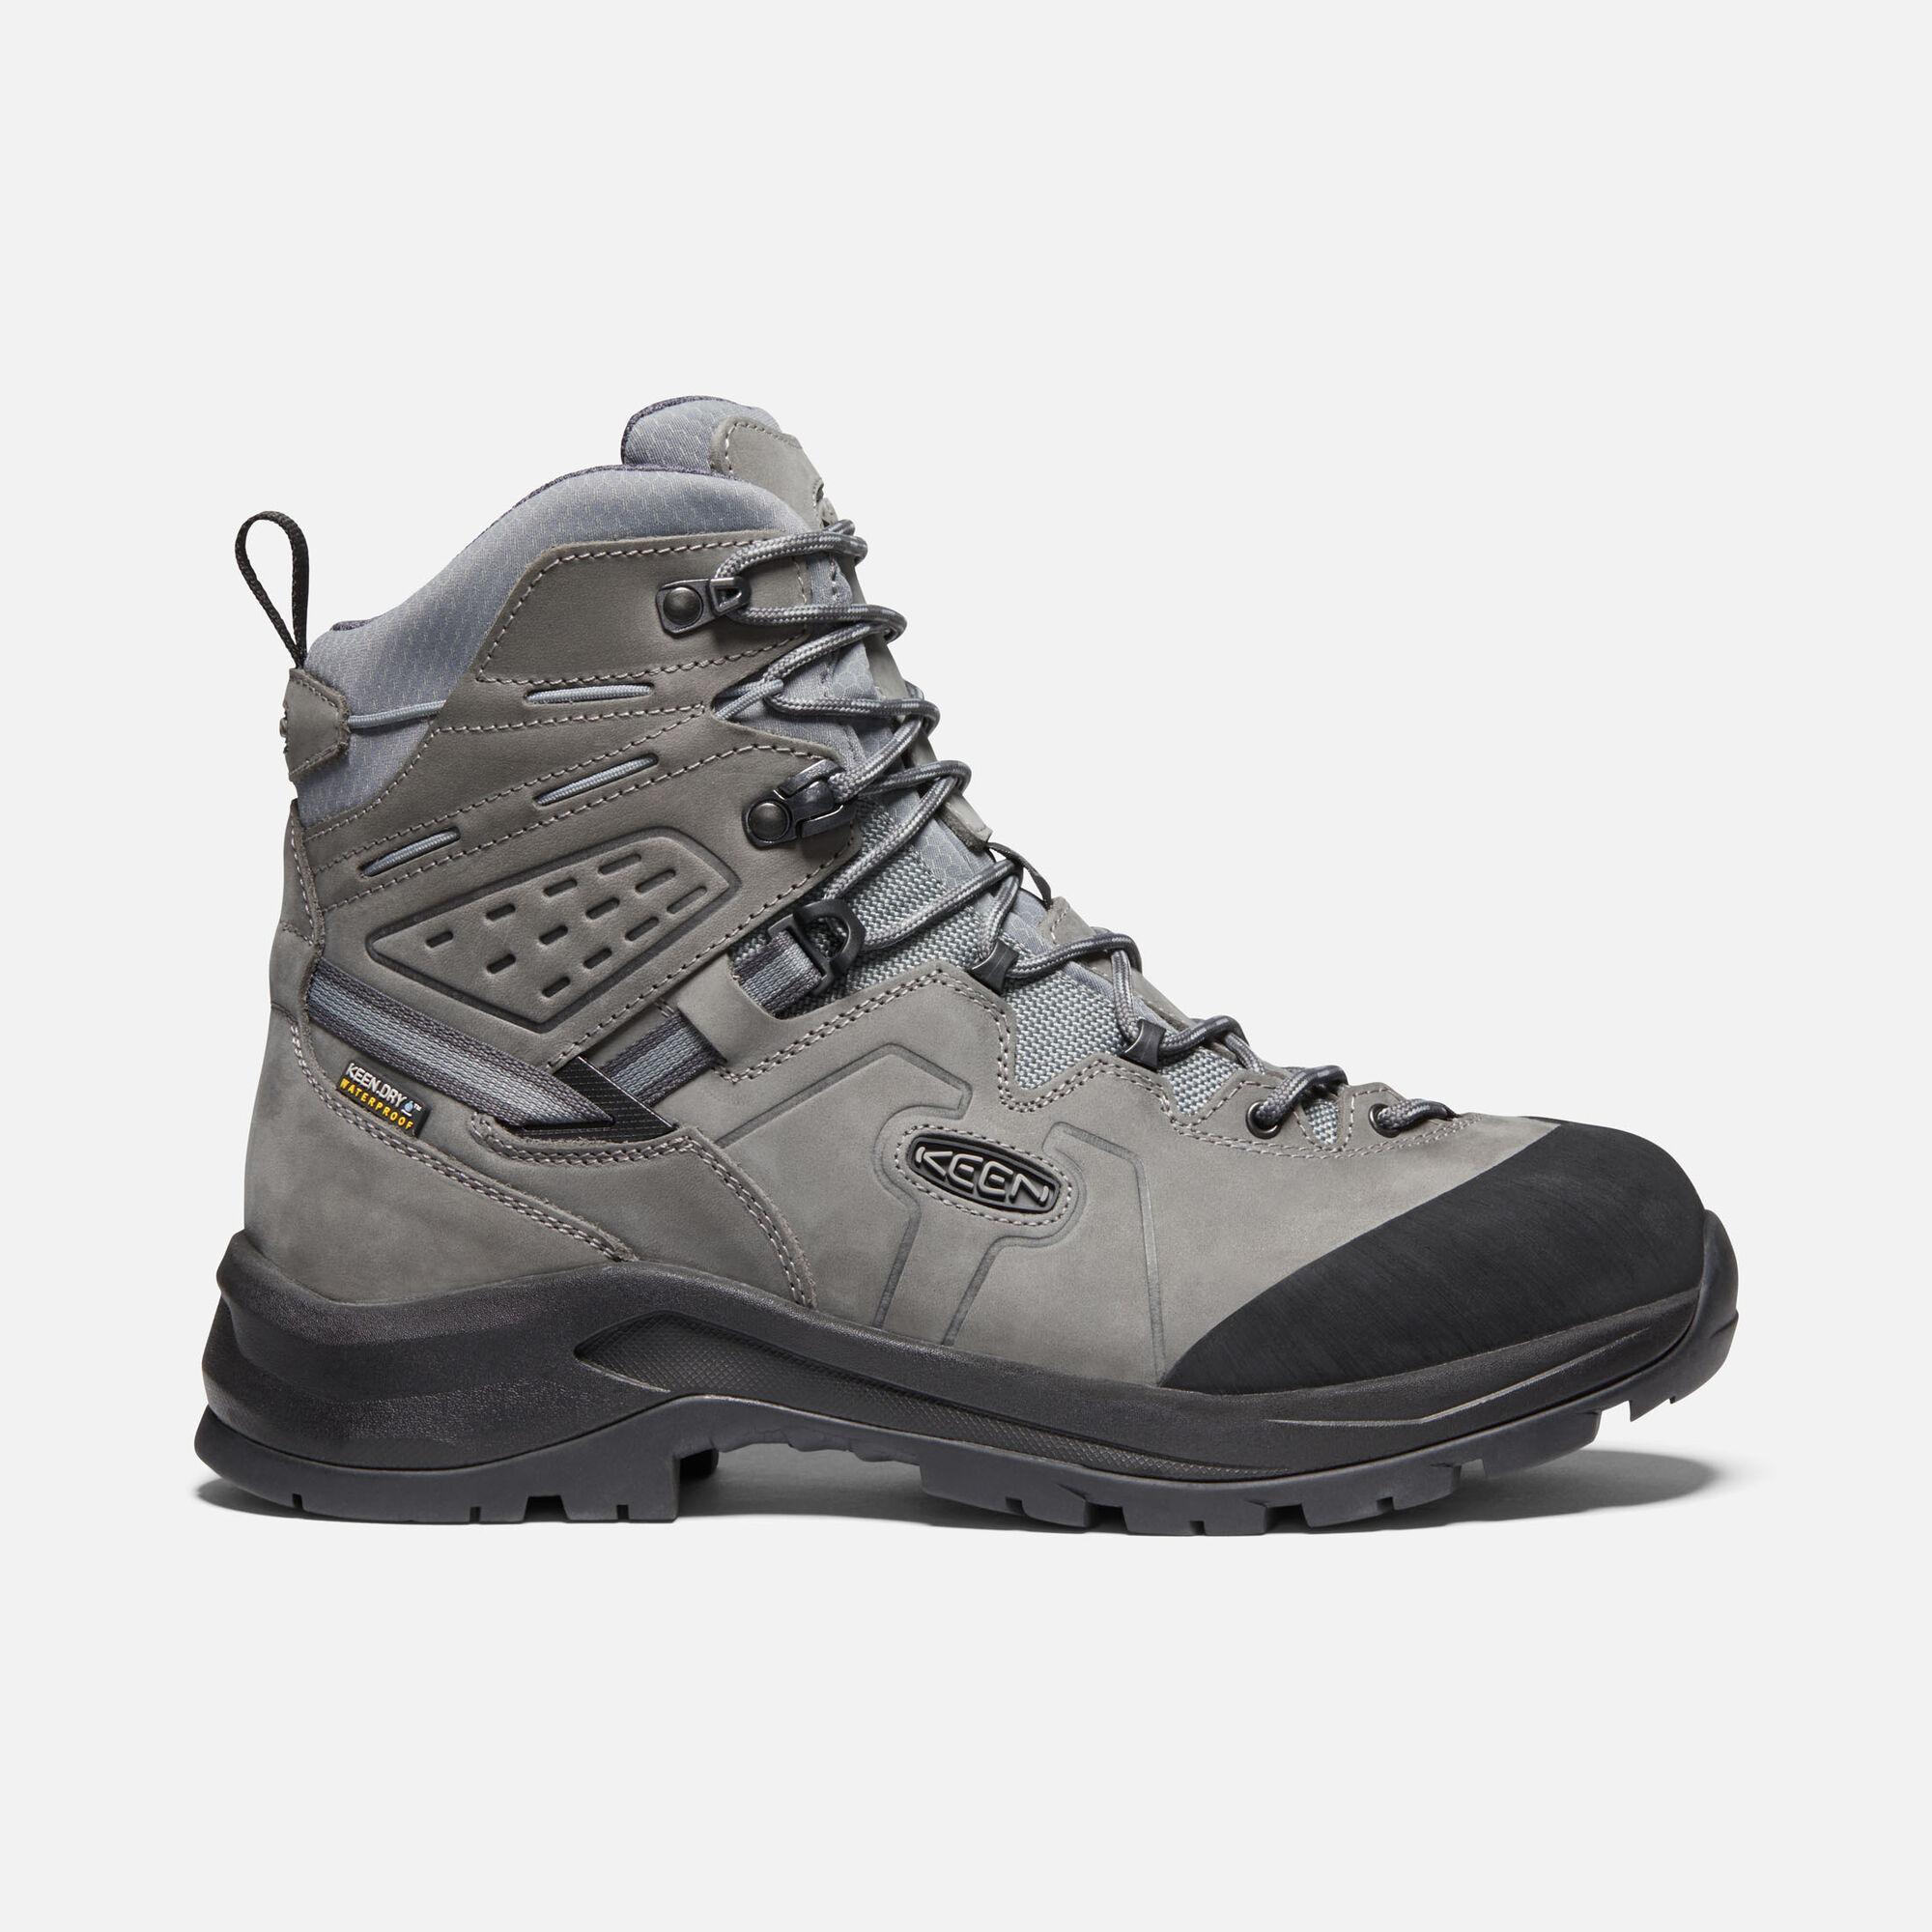 Karraig Mid WP Boot - Men's